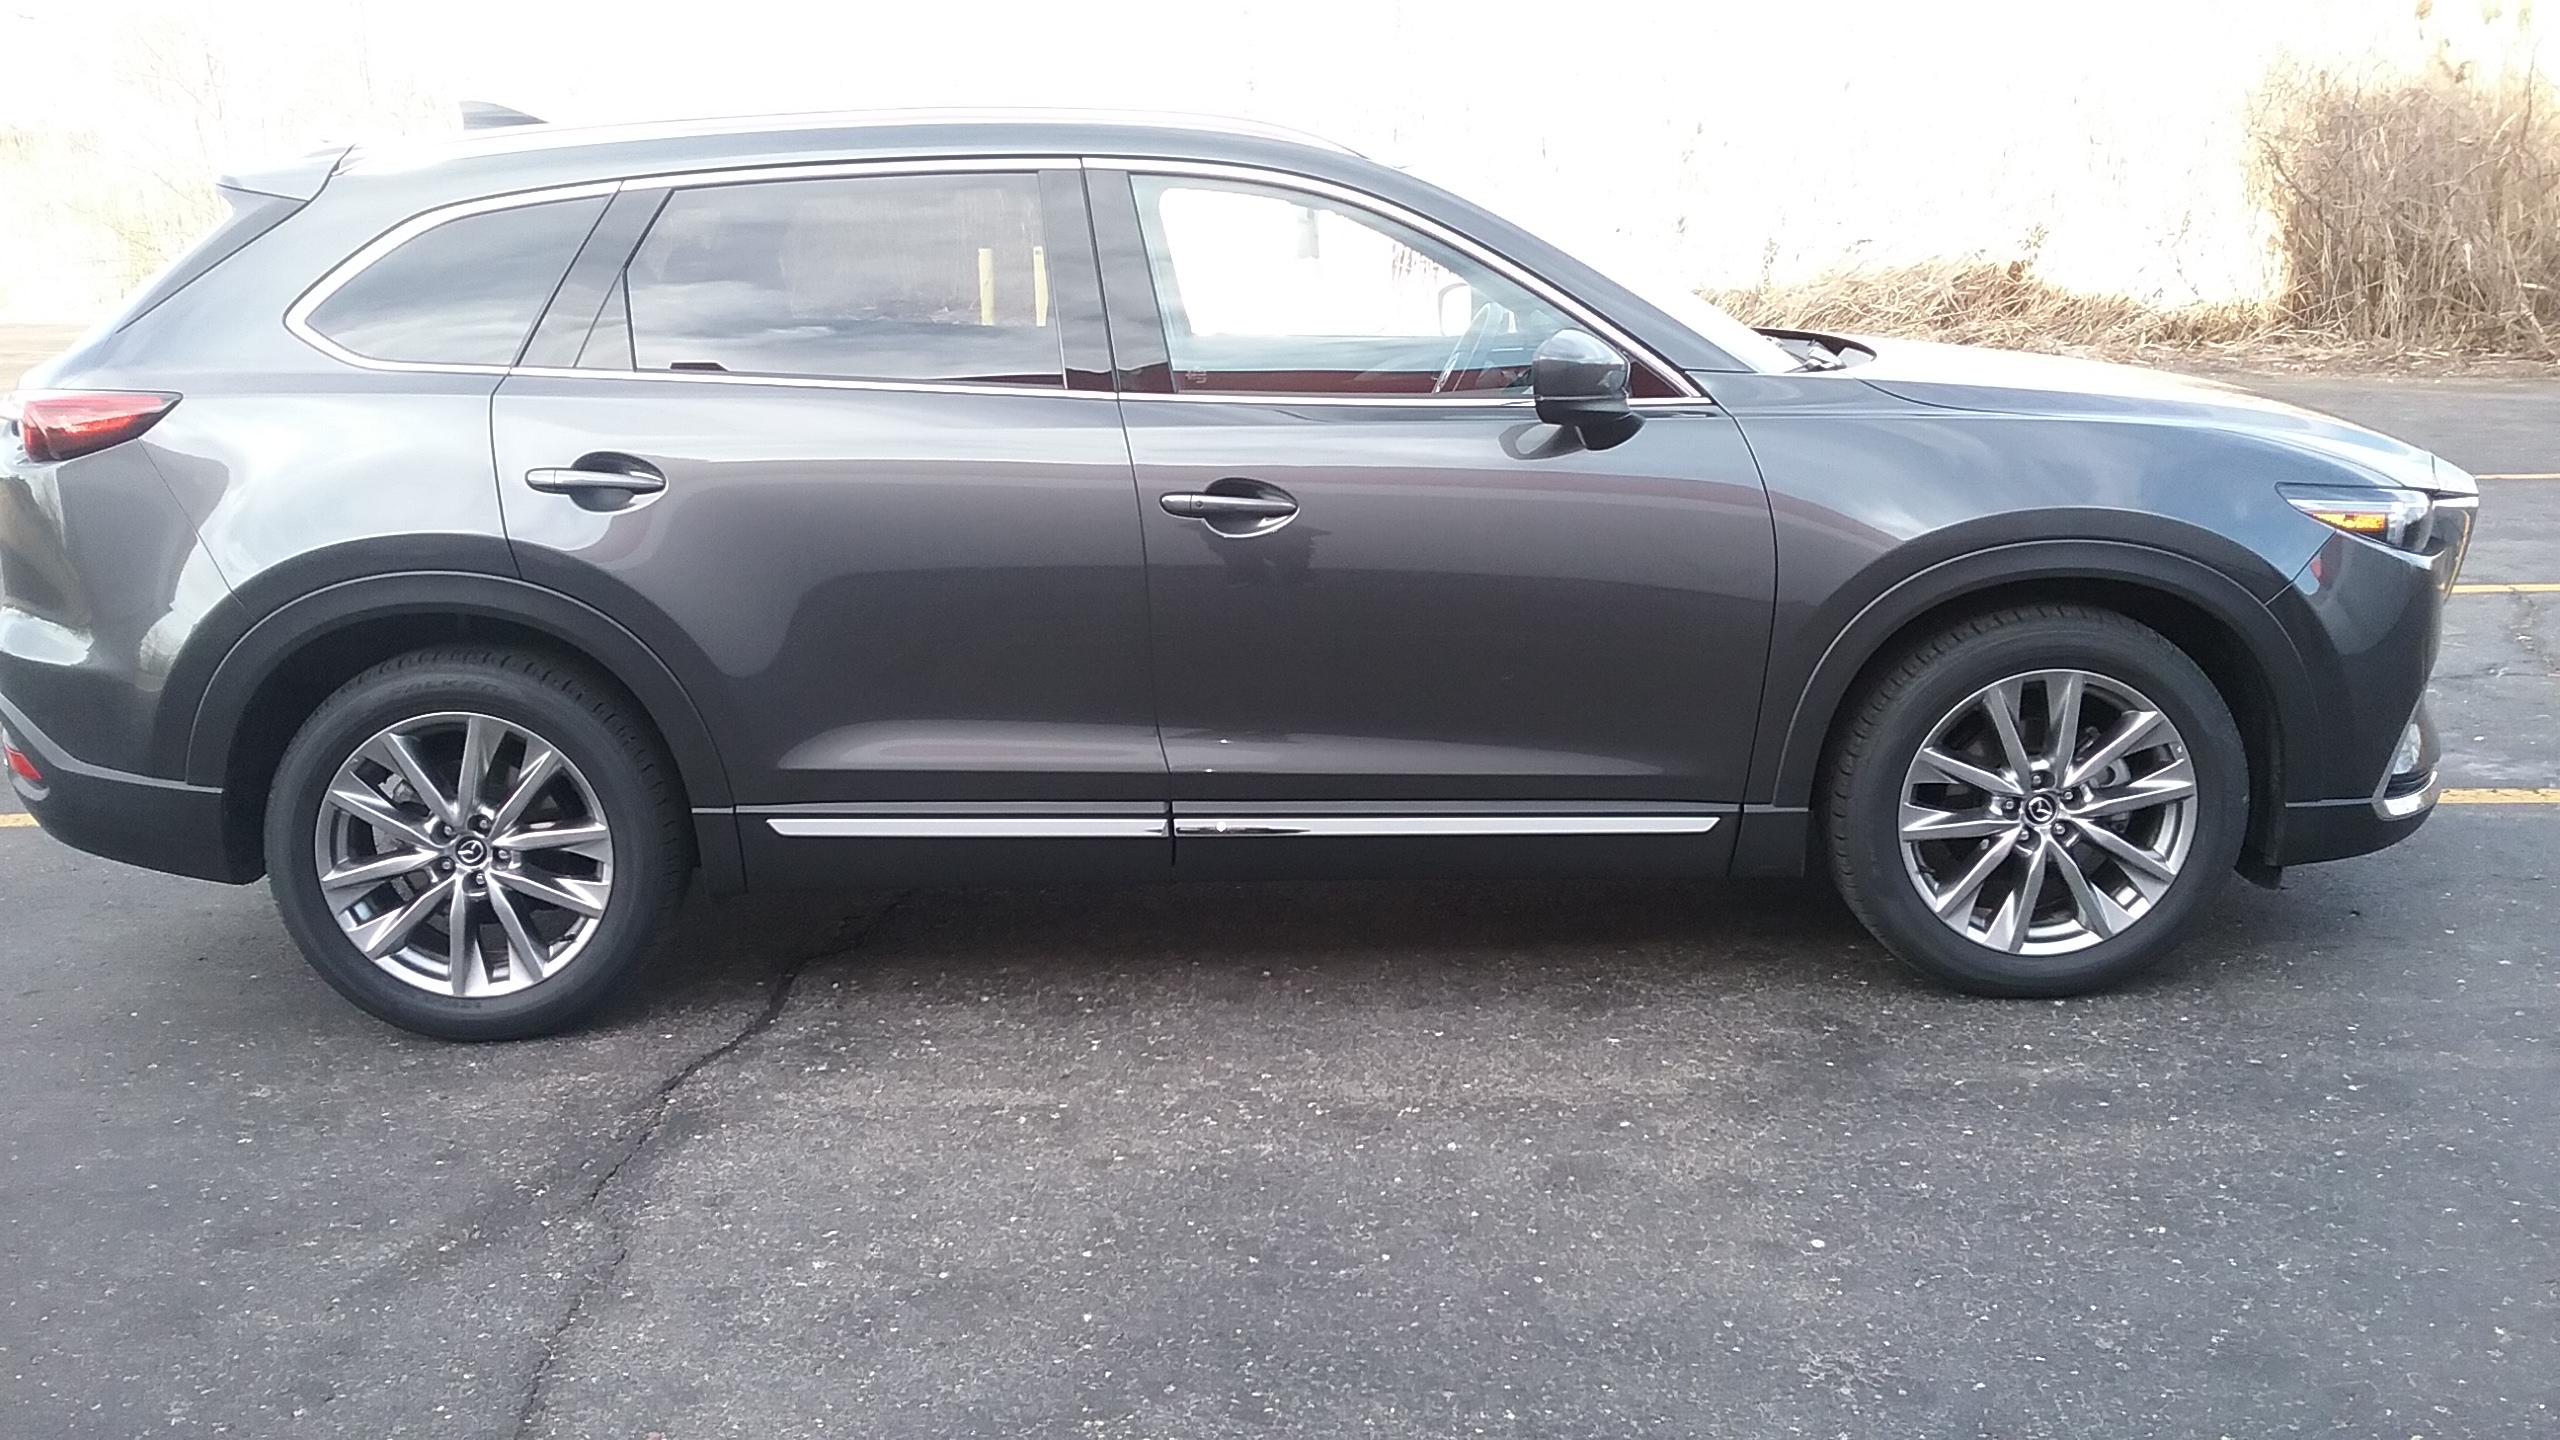 The 2017 Mazda CX-9 Signature AWD, I Think I've Fallen In Love With A Car! #DriveMazda #DriveShop #ad